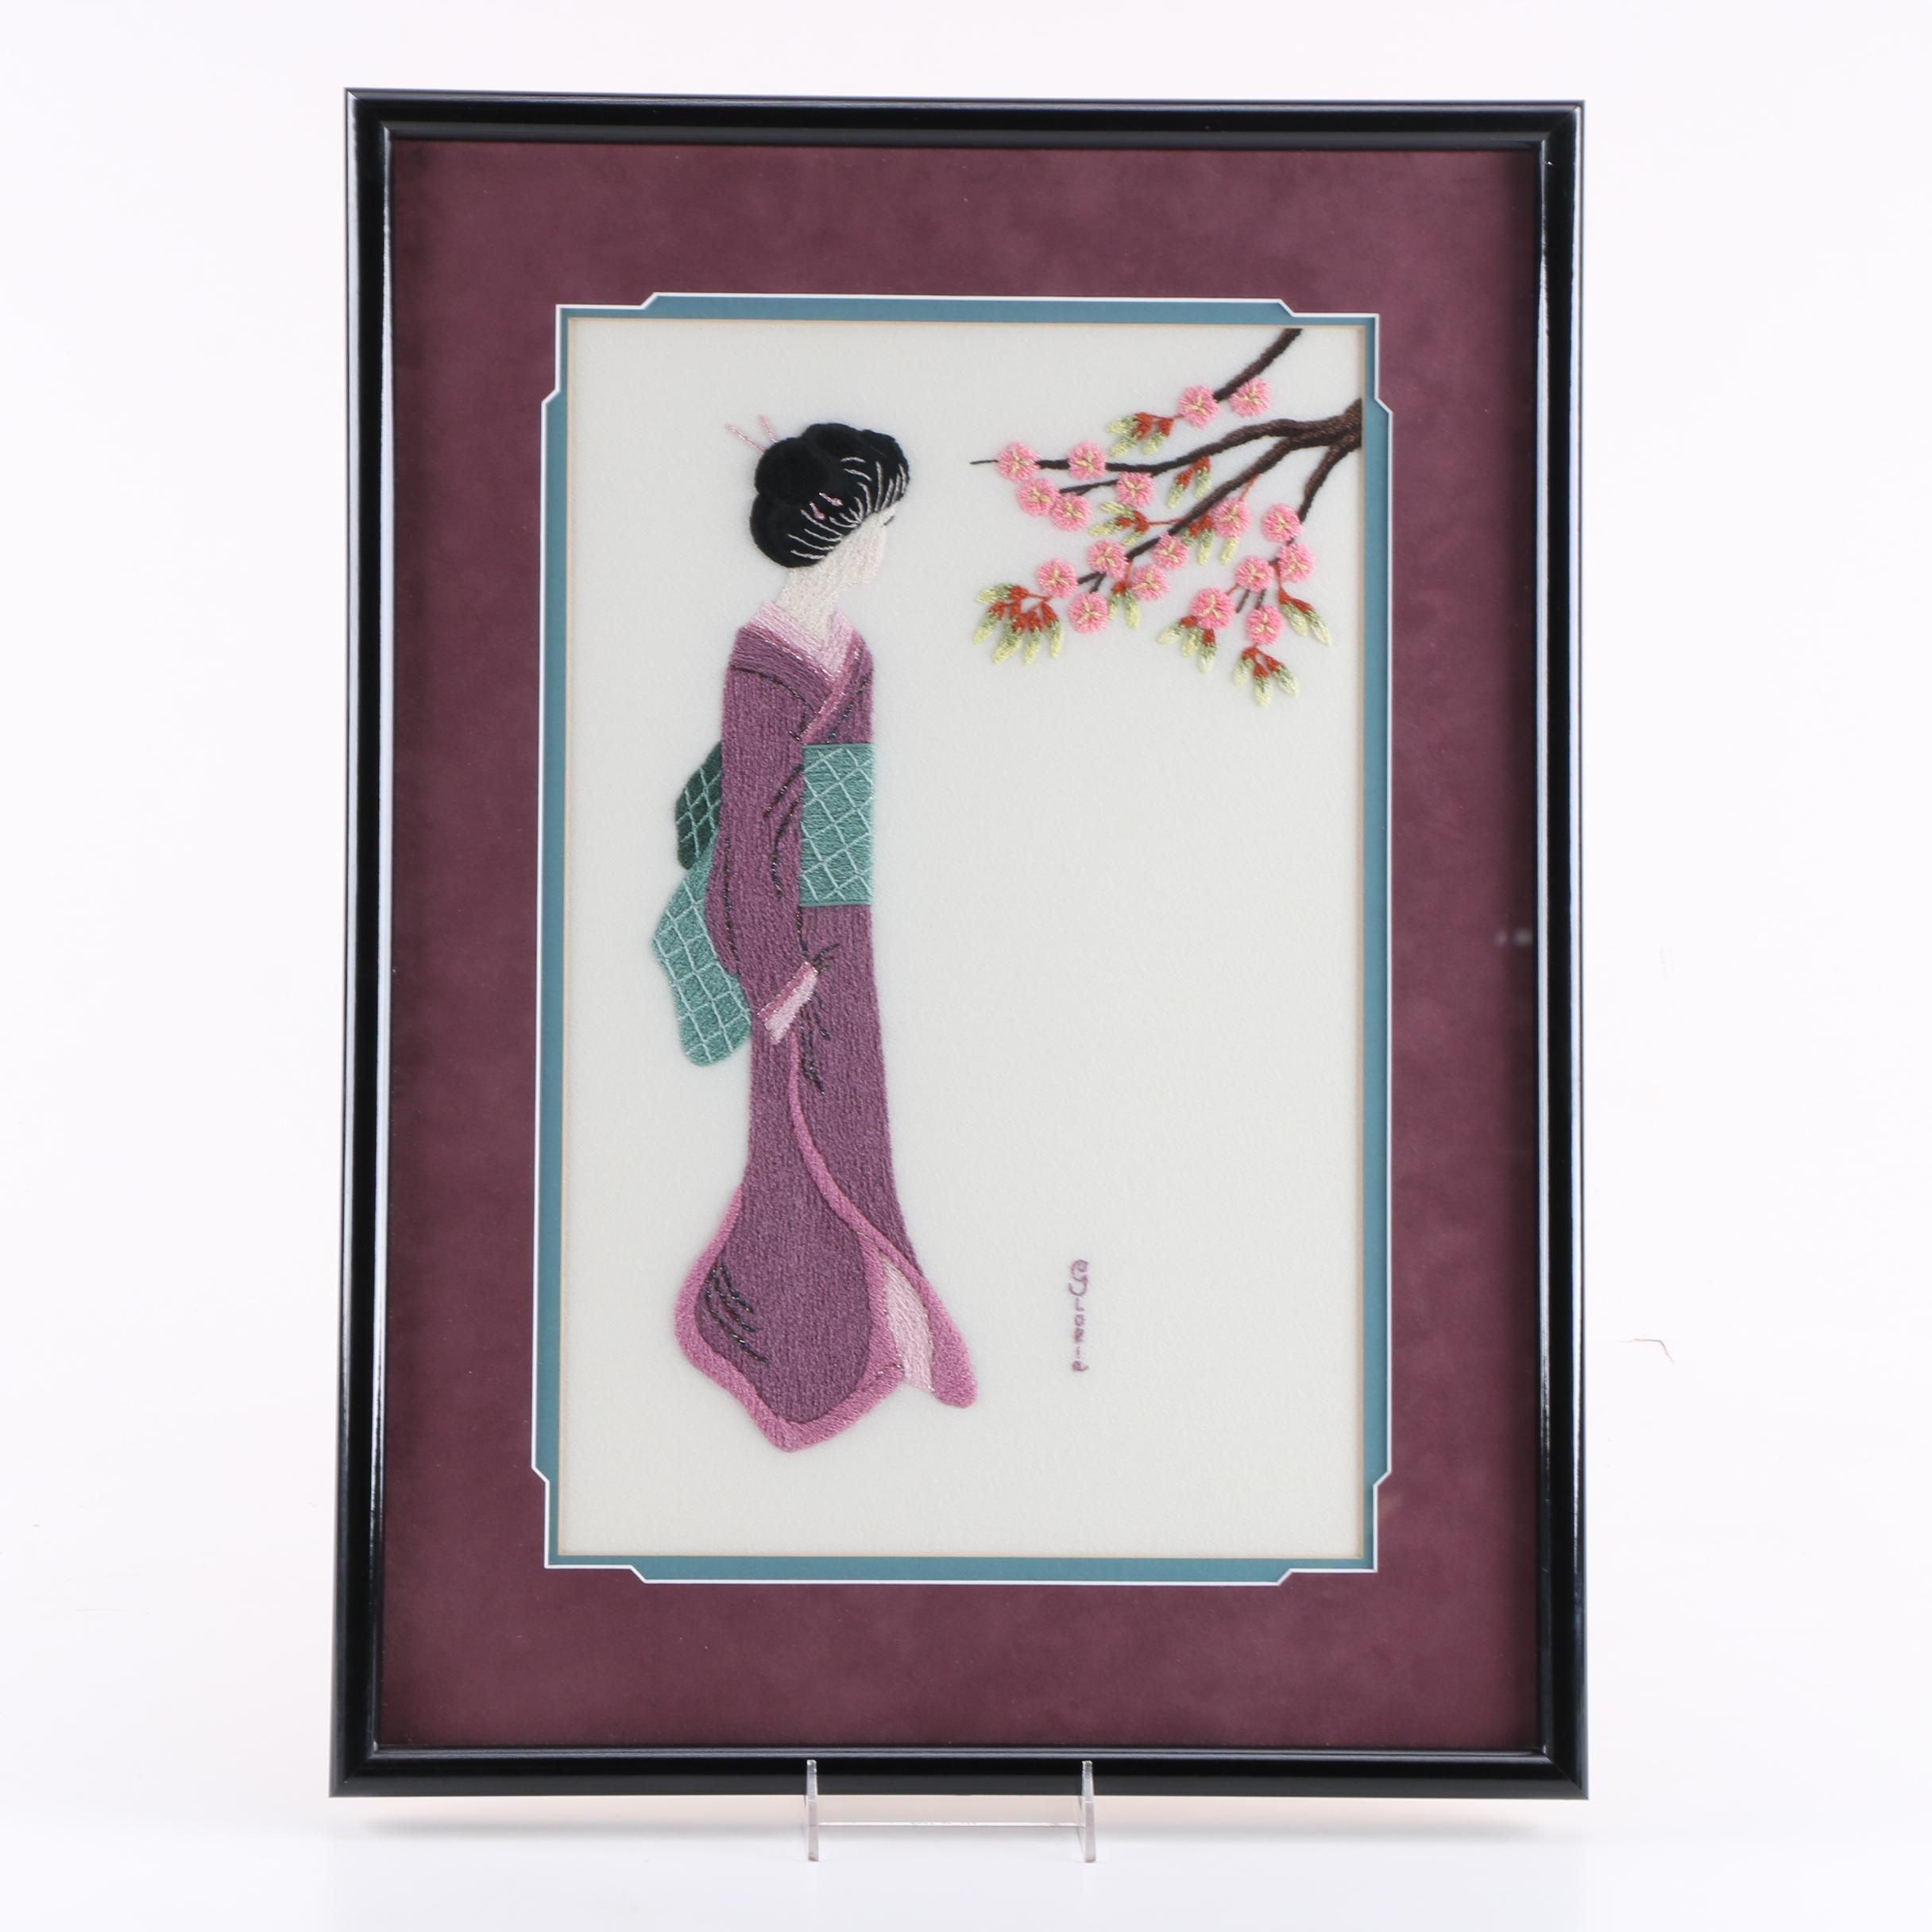 Japanese-Style Bunka Shishu Figural Embroidery Piece